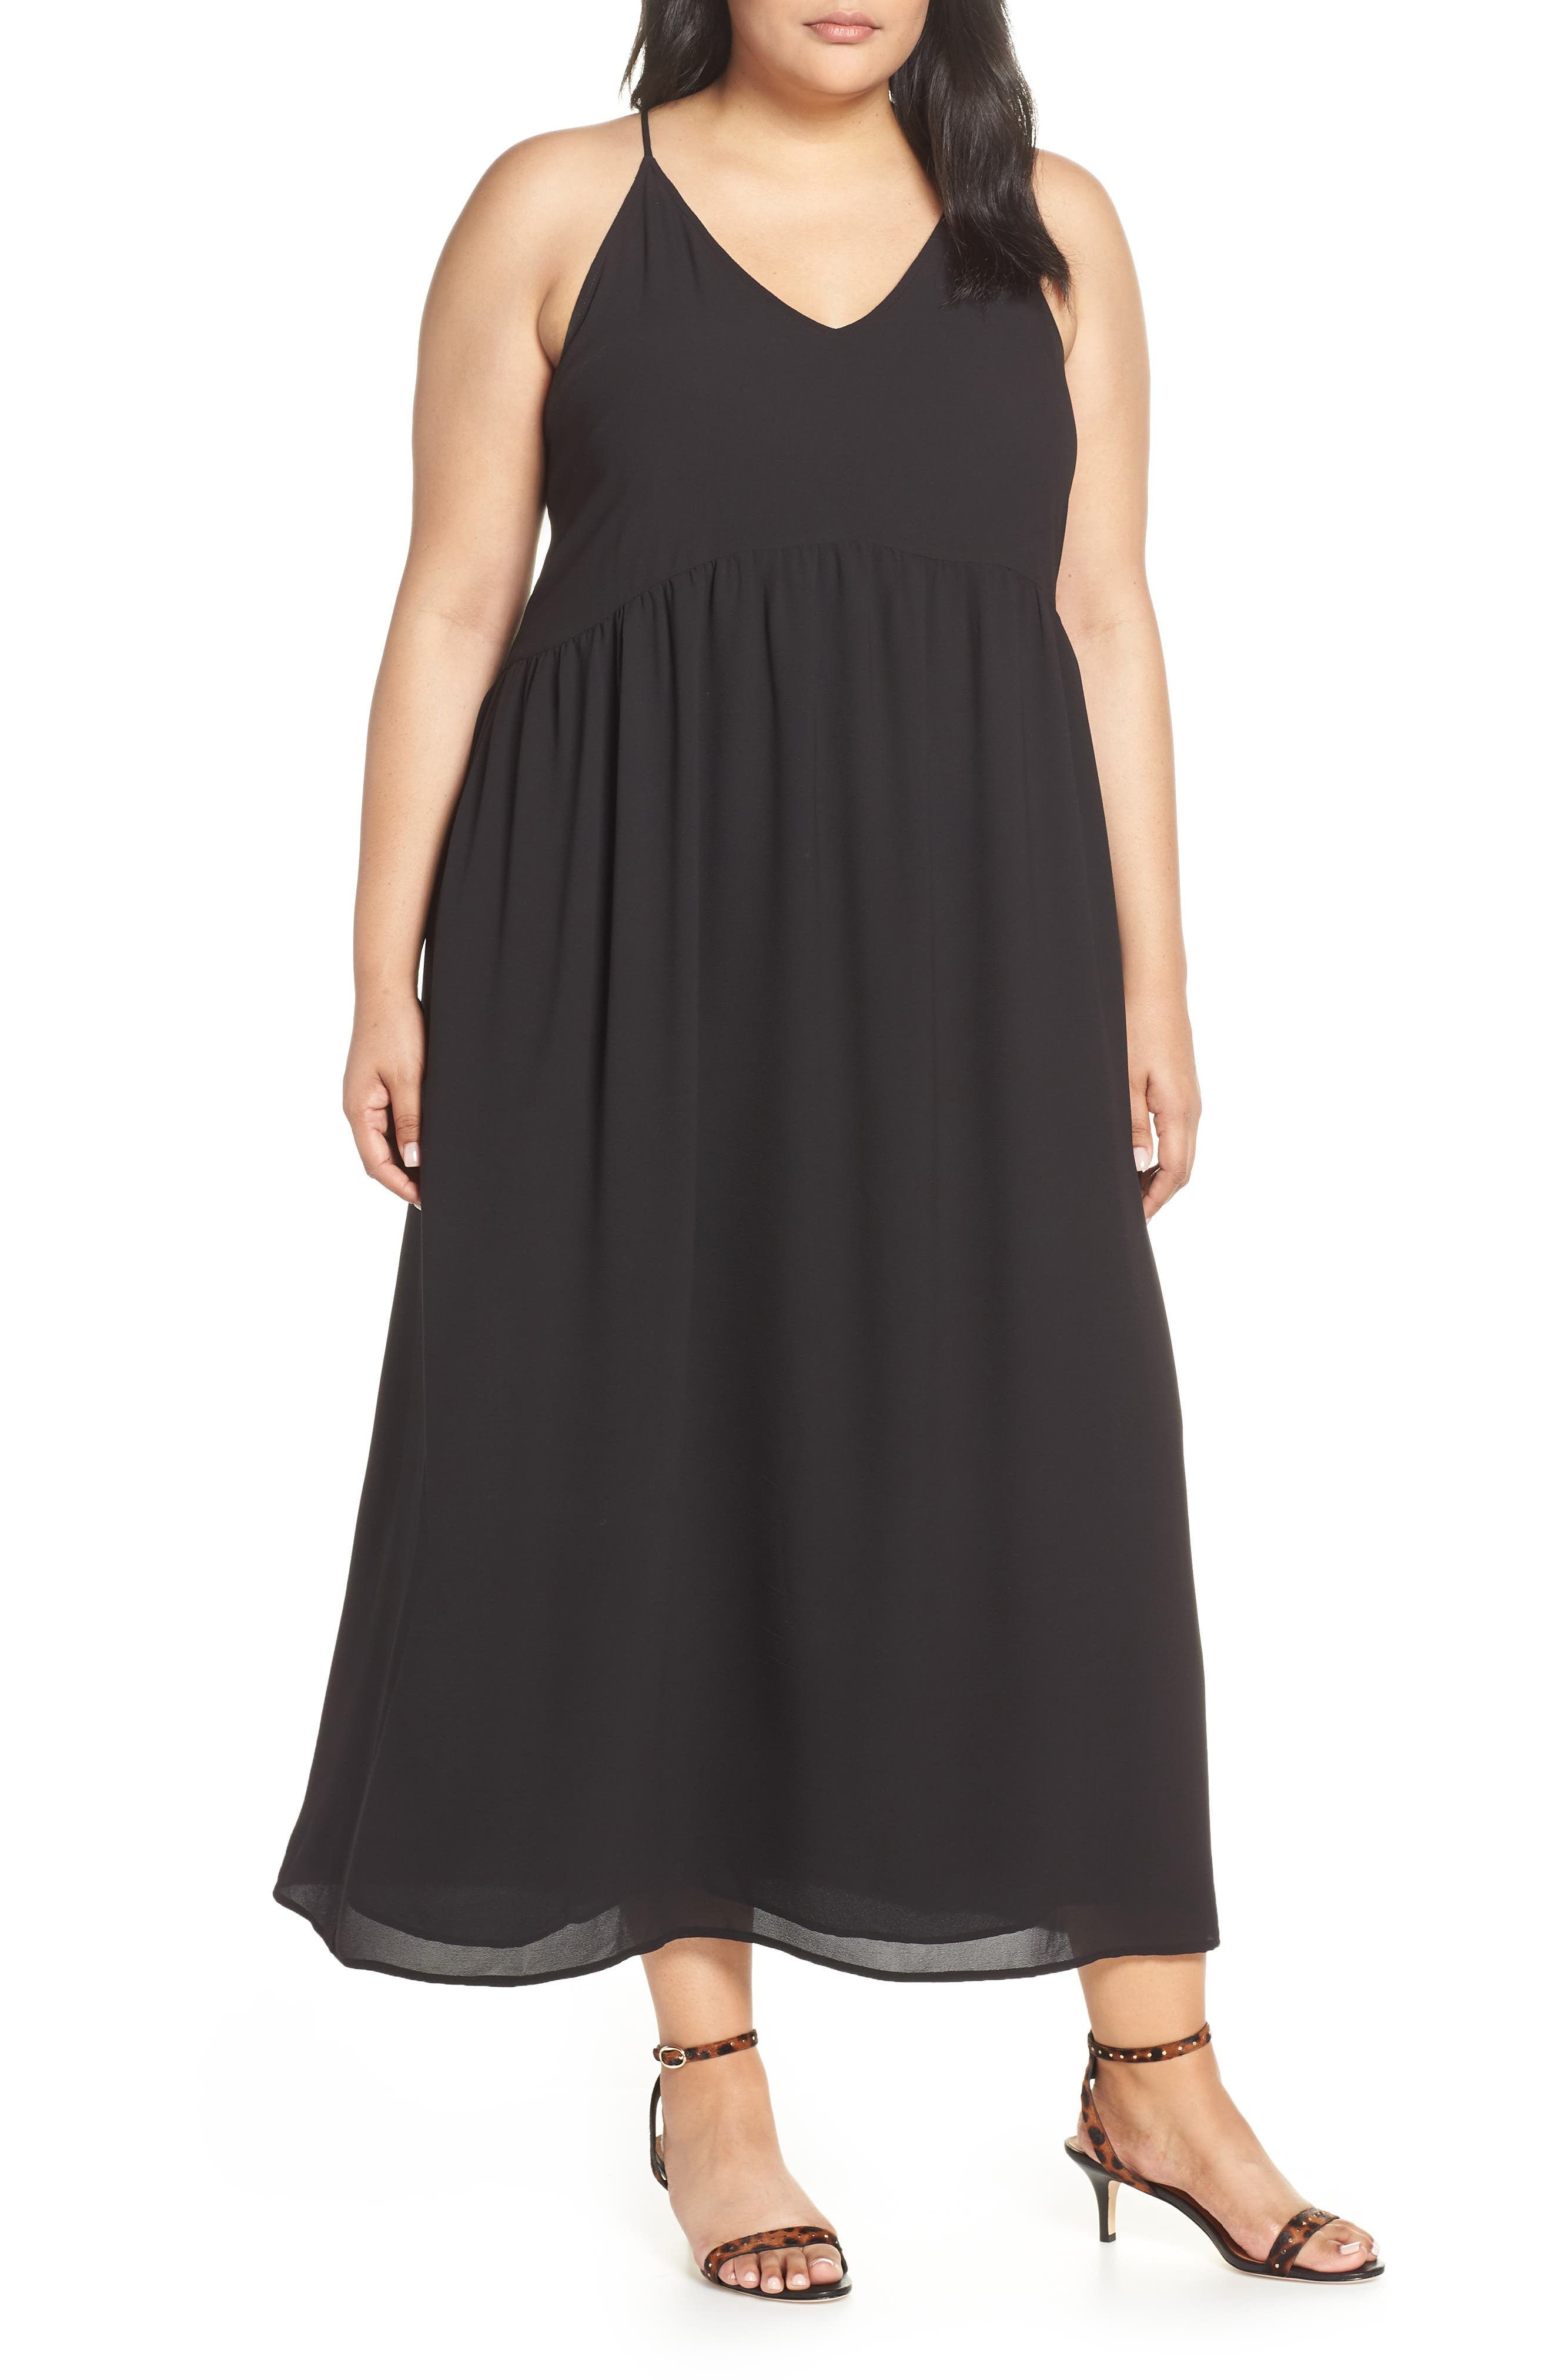 x Hi Sugarplum! Palm Springs Festival Maxi Dress, Main, color, BLACK